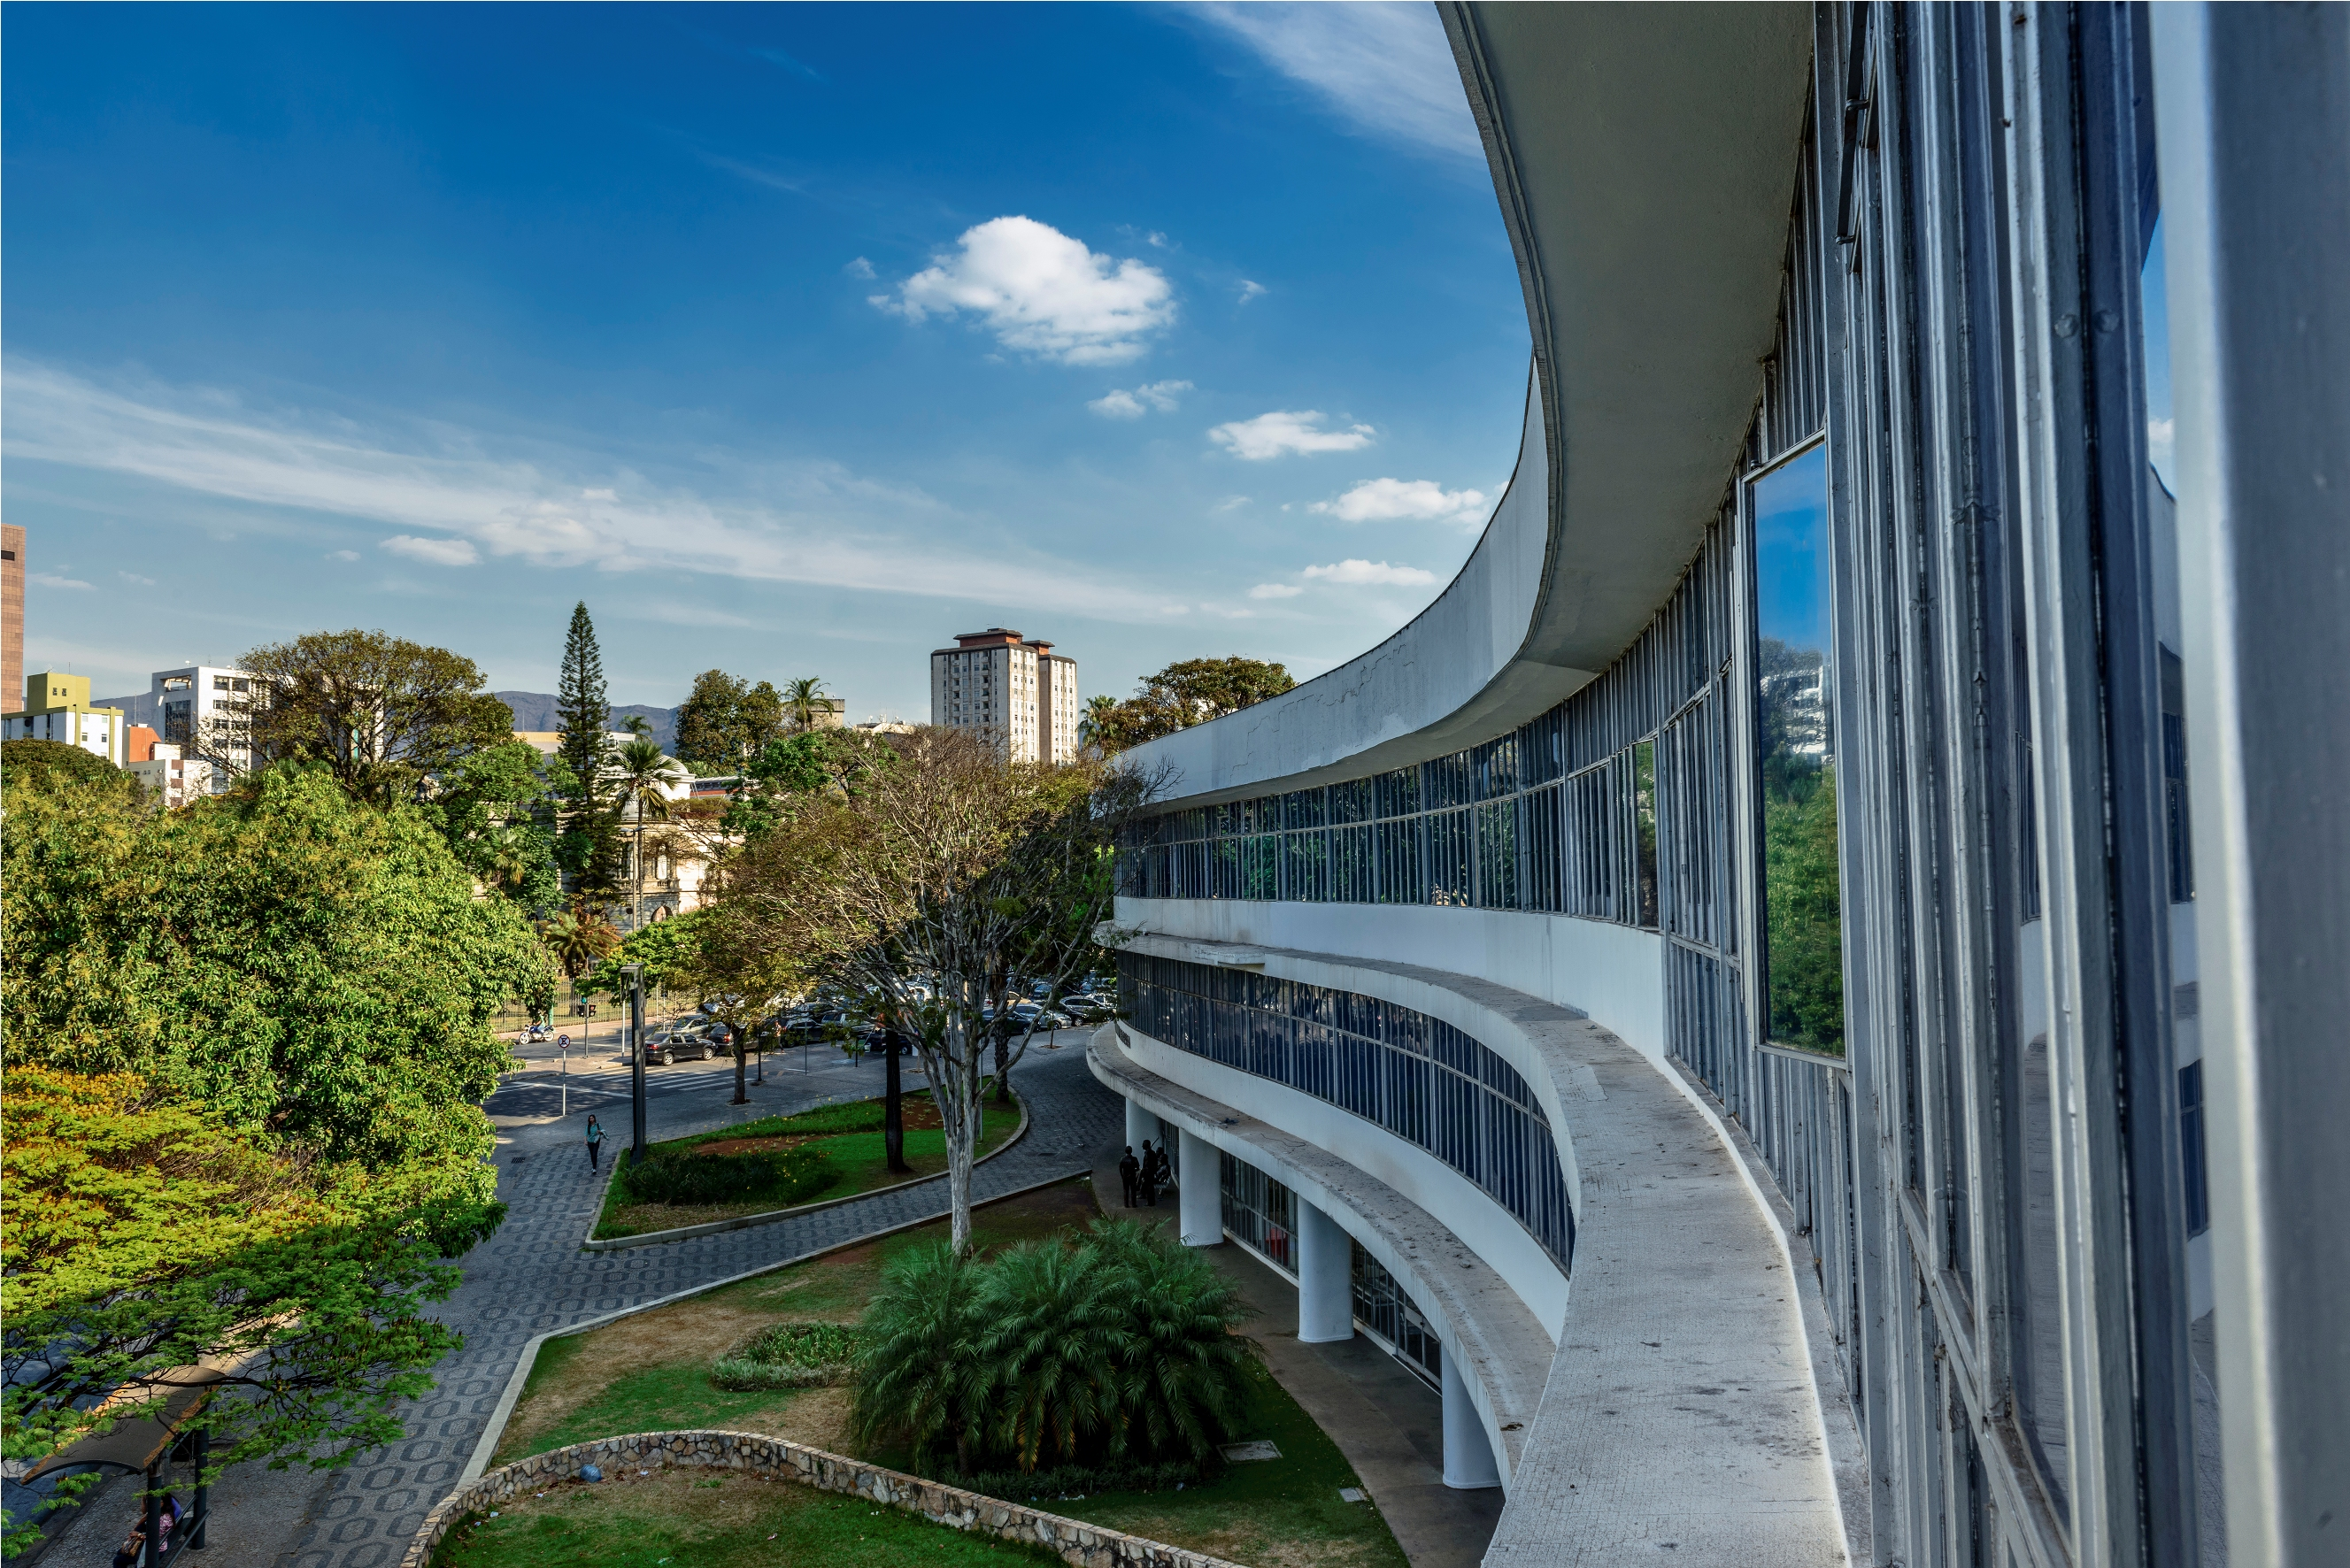 Biblioteca Pública Estadual Luiz de Bessa (Foto: Juninho Motta)